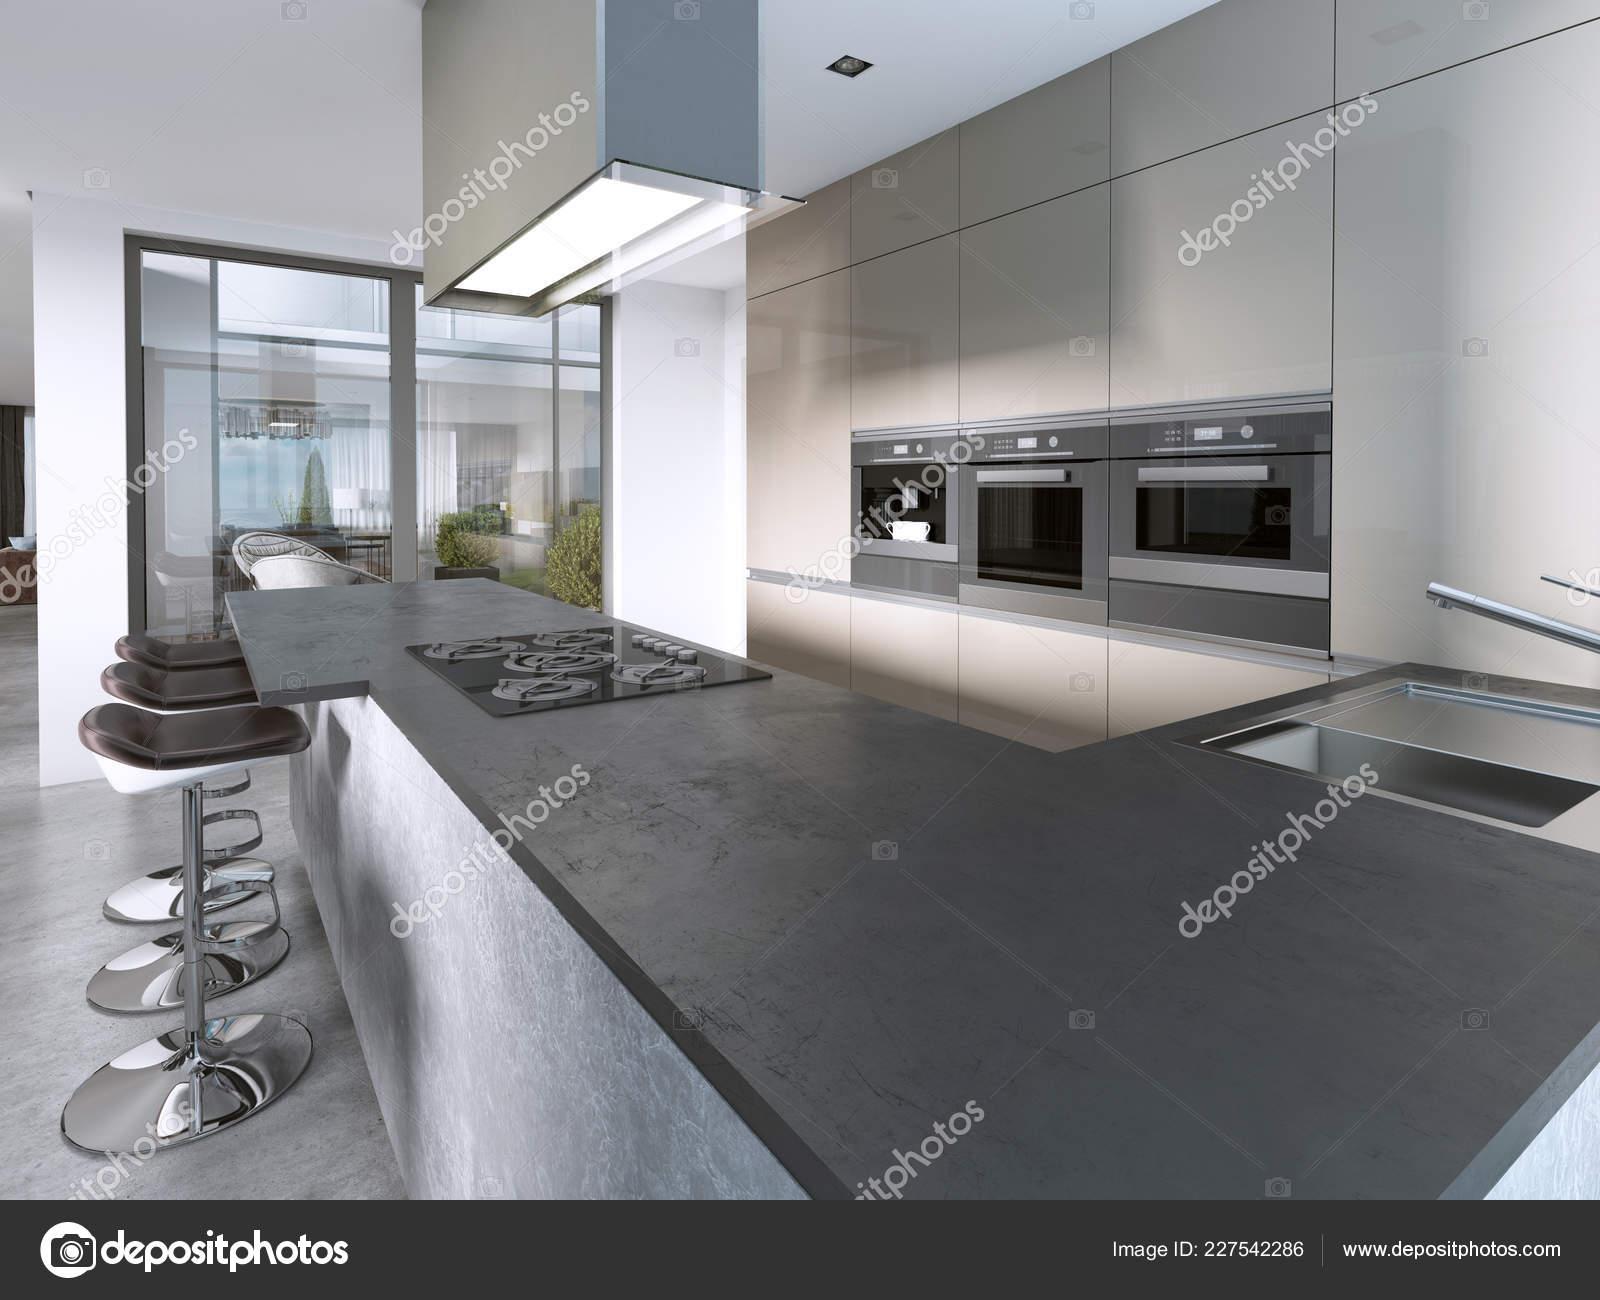 Contemporary Kitchen Large Windows Island Bar Stools